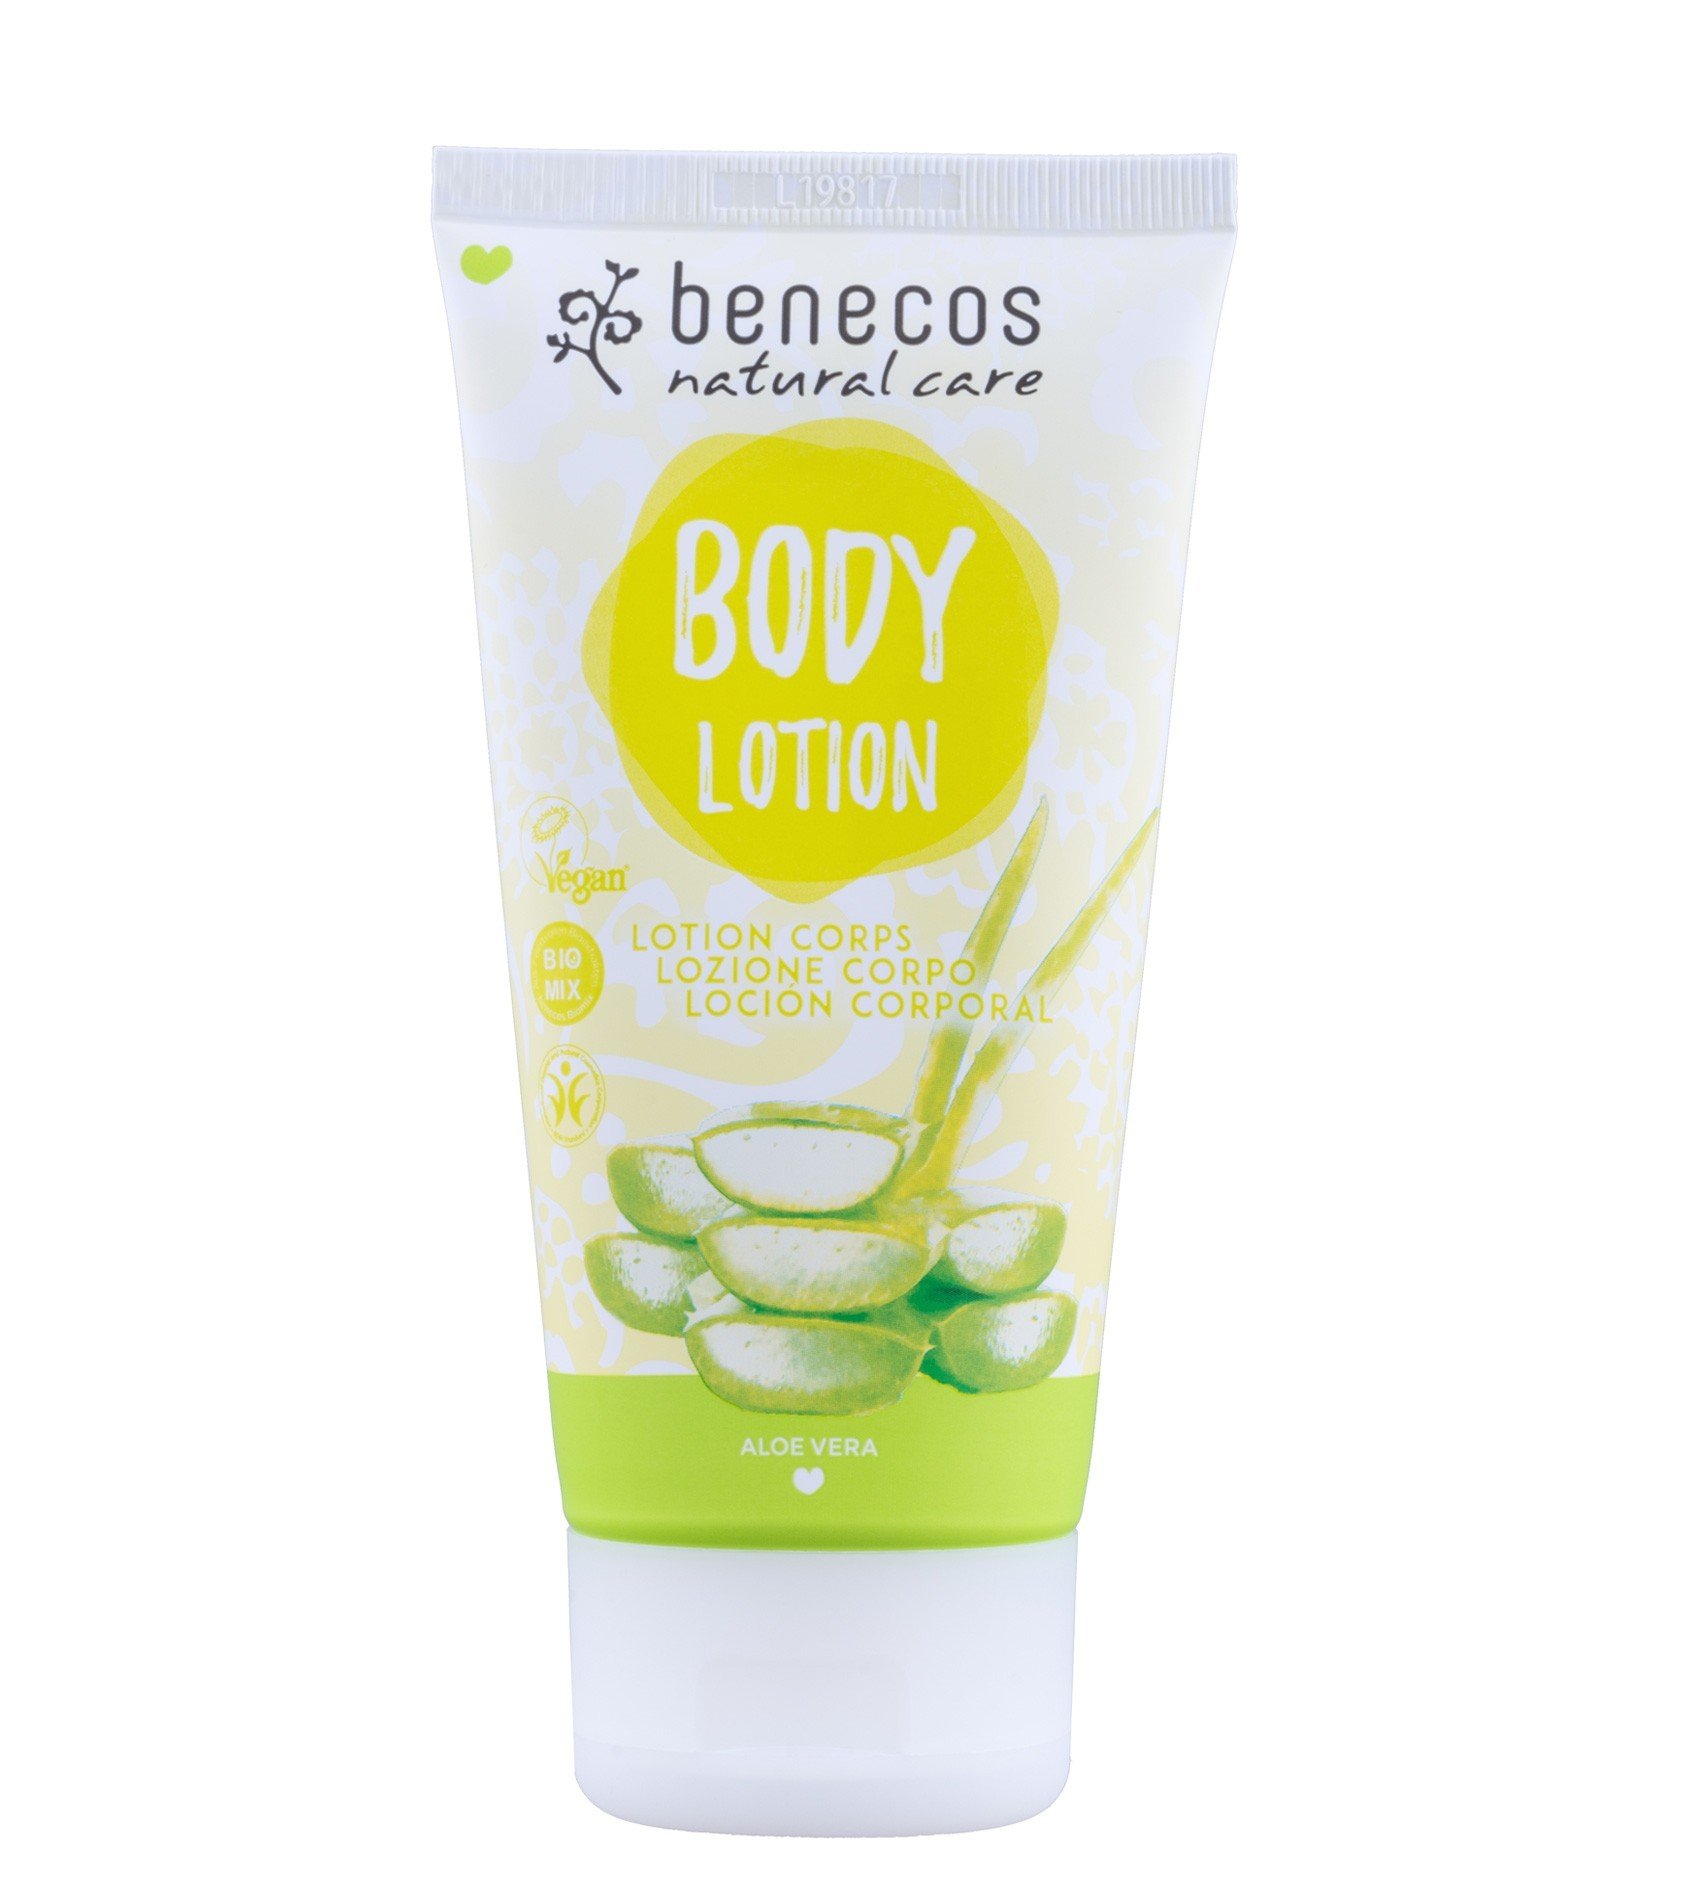 Benecos Vegan Aloe Vera Body Lotion